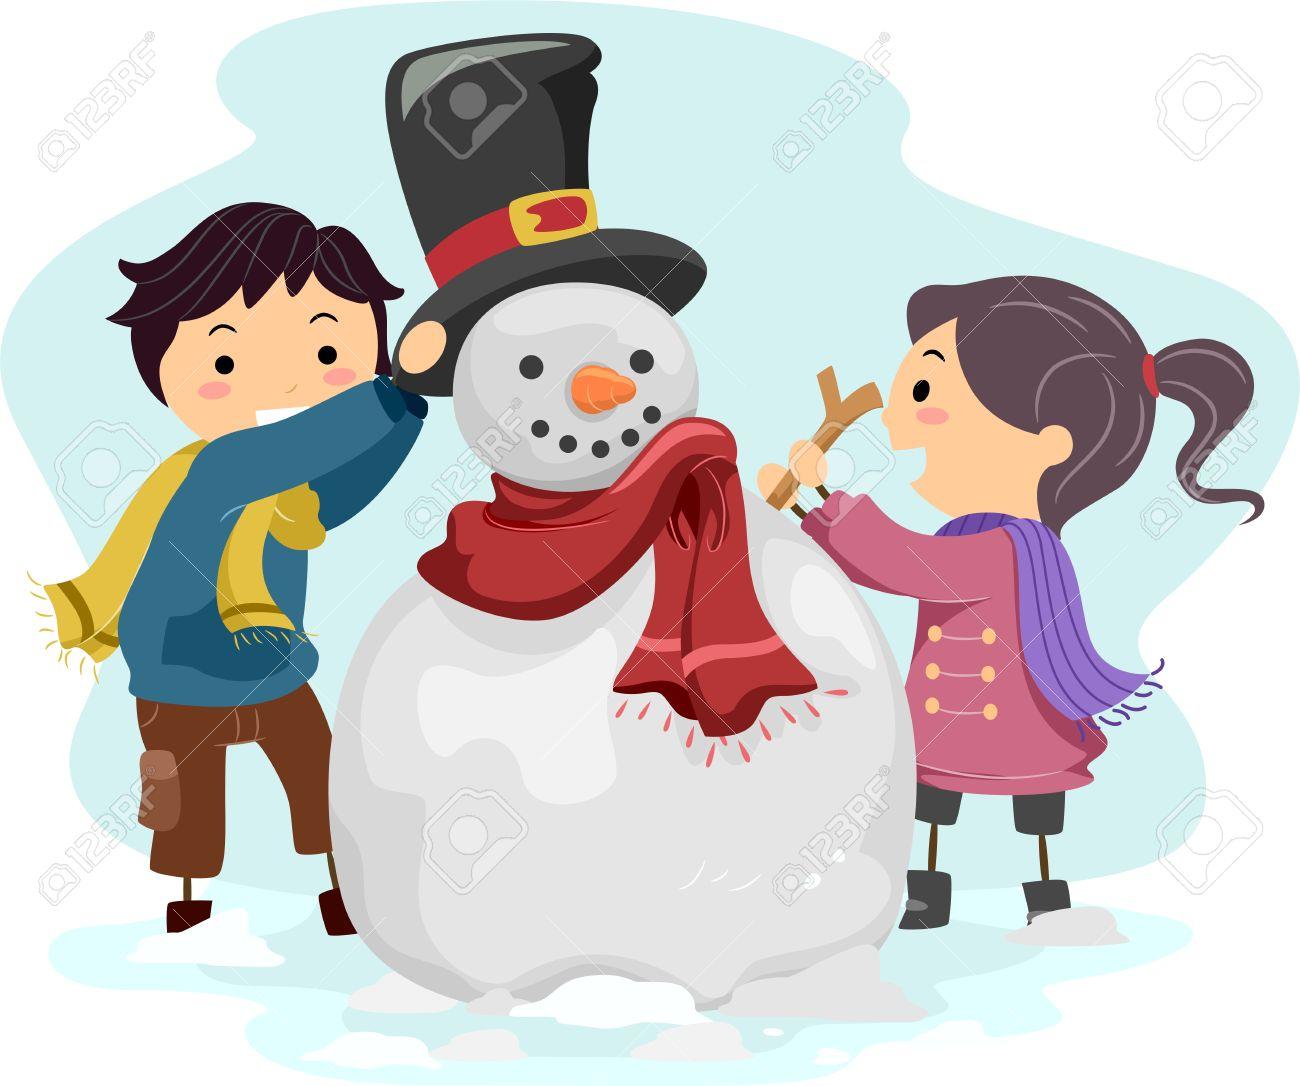 Illustration of Kids Making a Snowman Stock Photo - 11467608